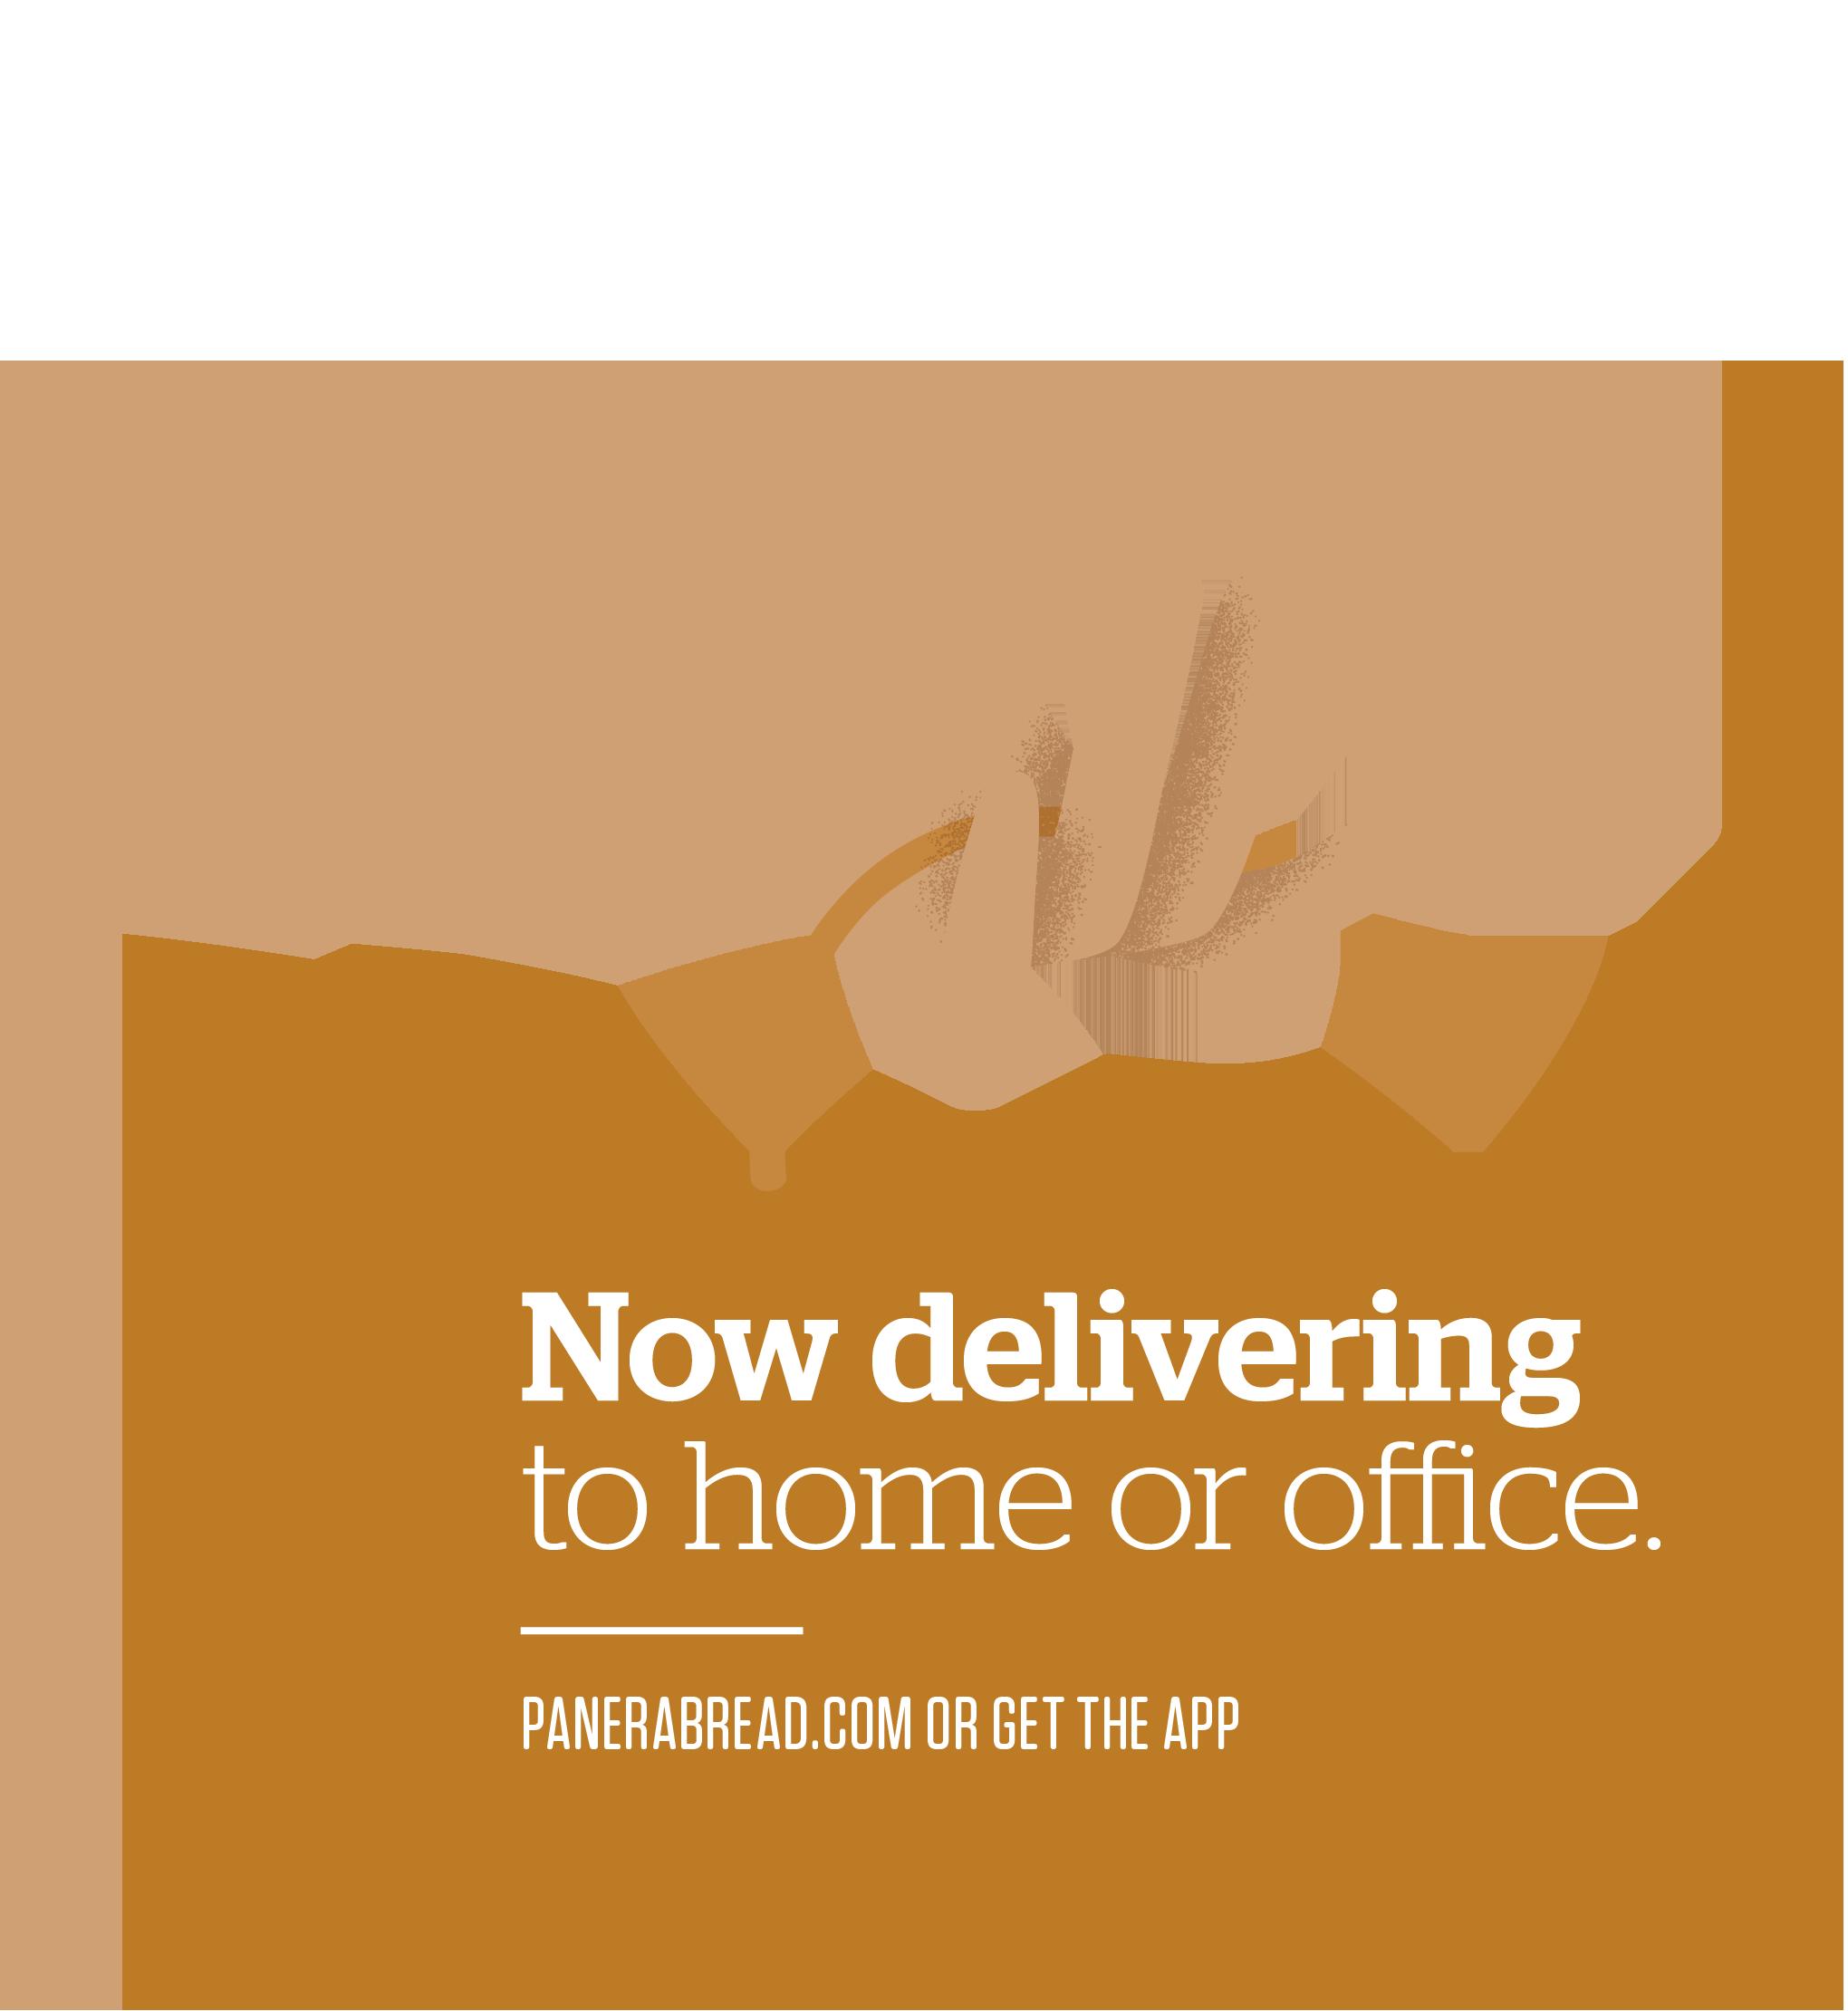 Branding - Panera Delivers Intro Image